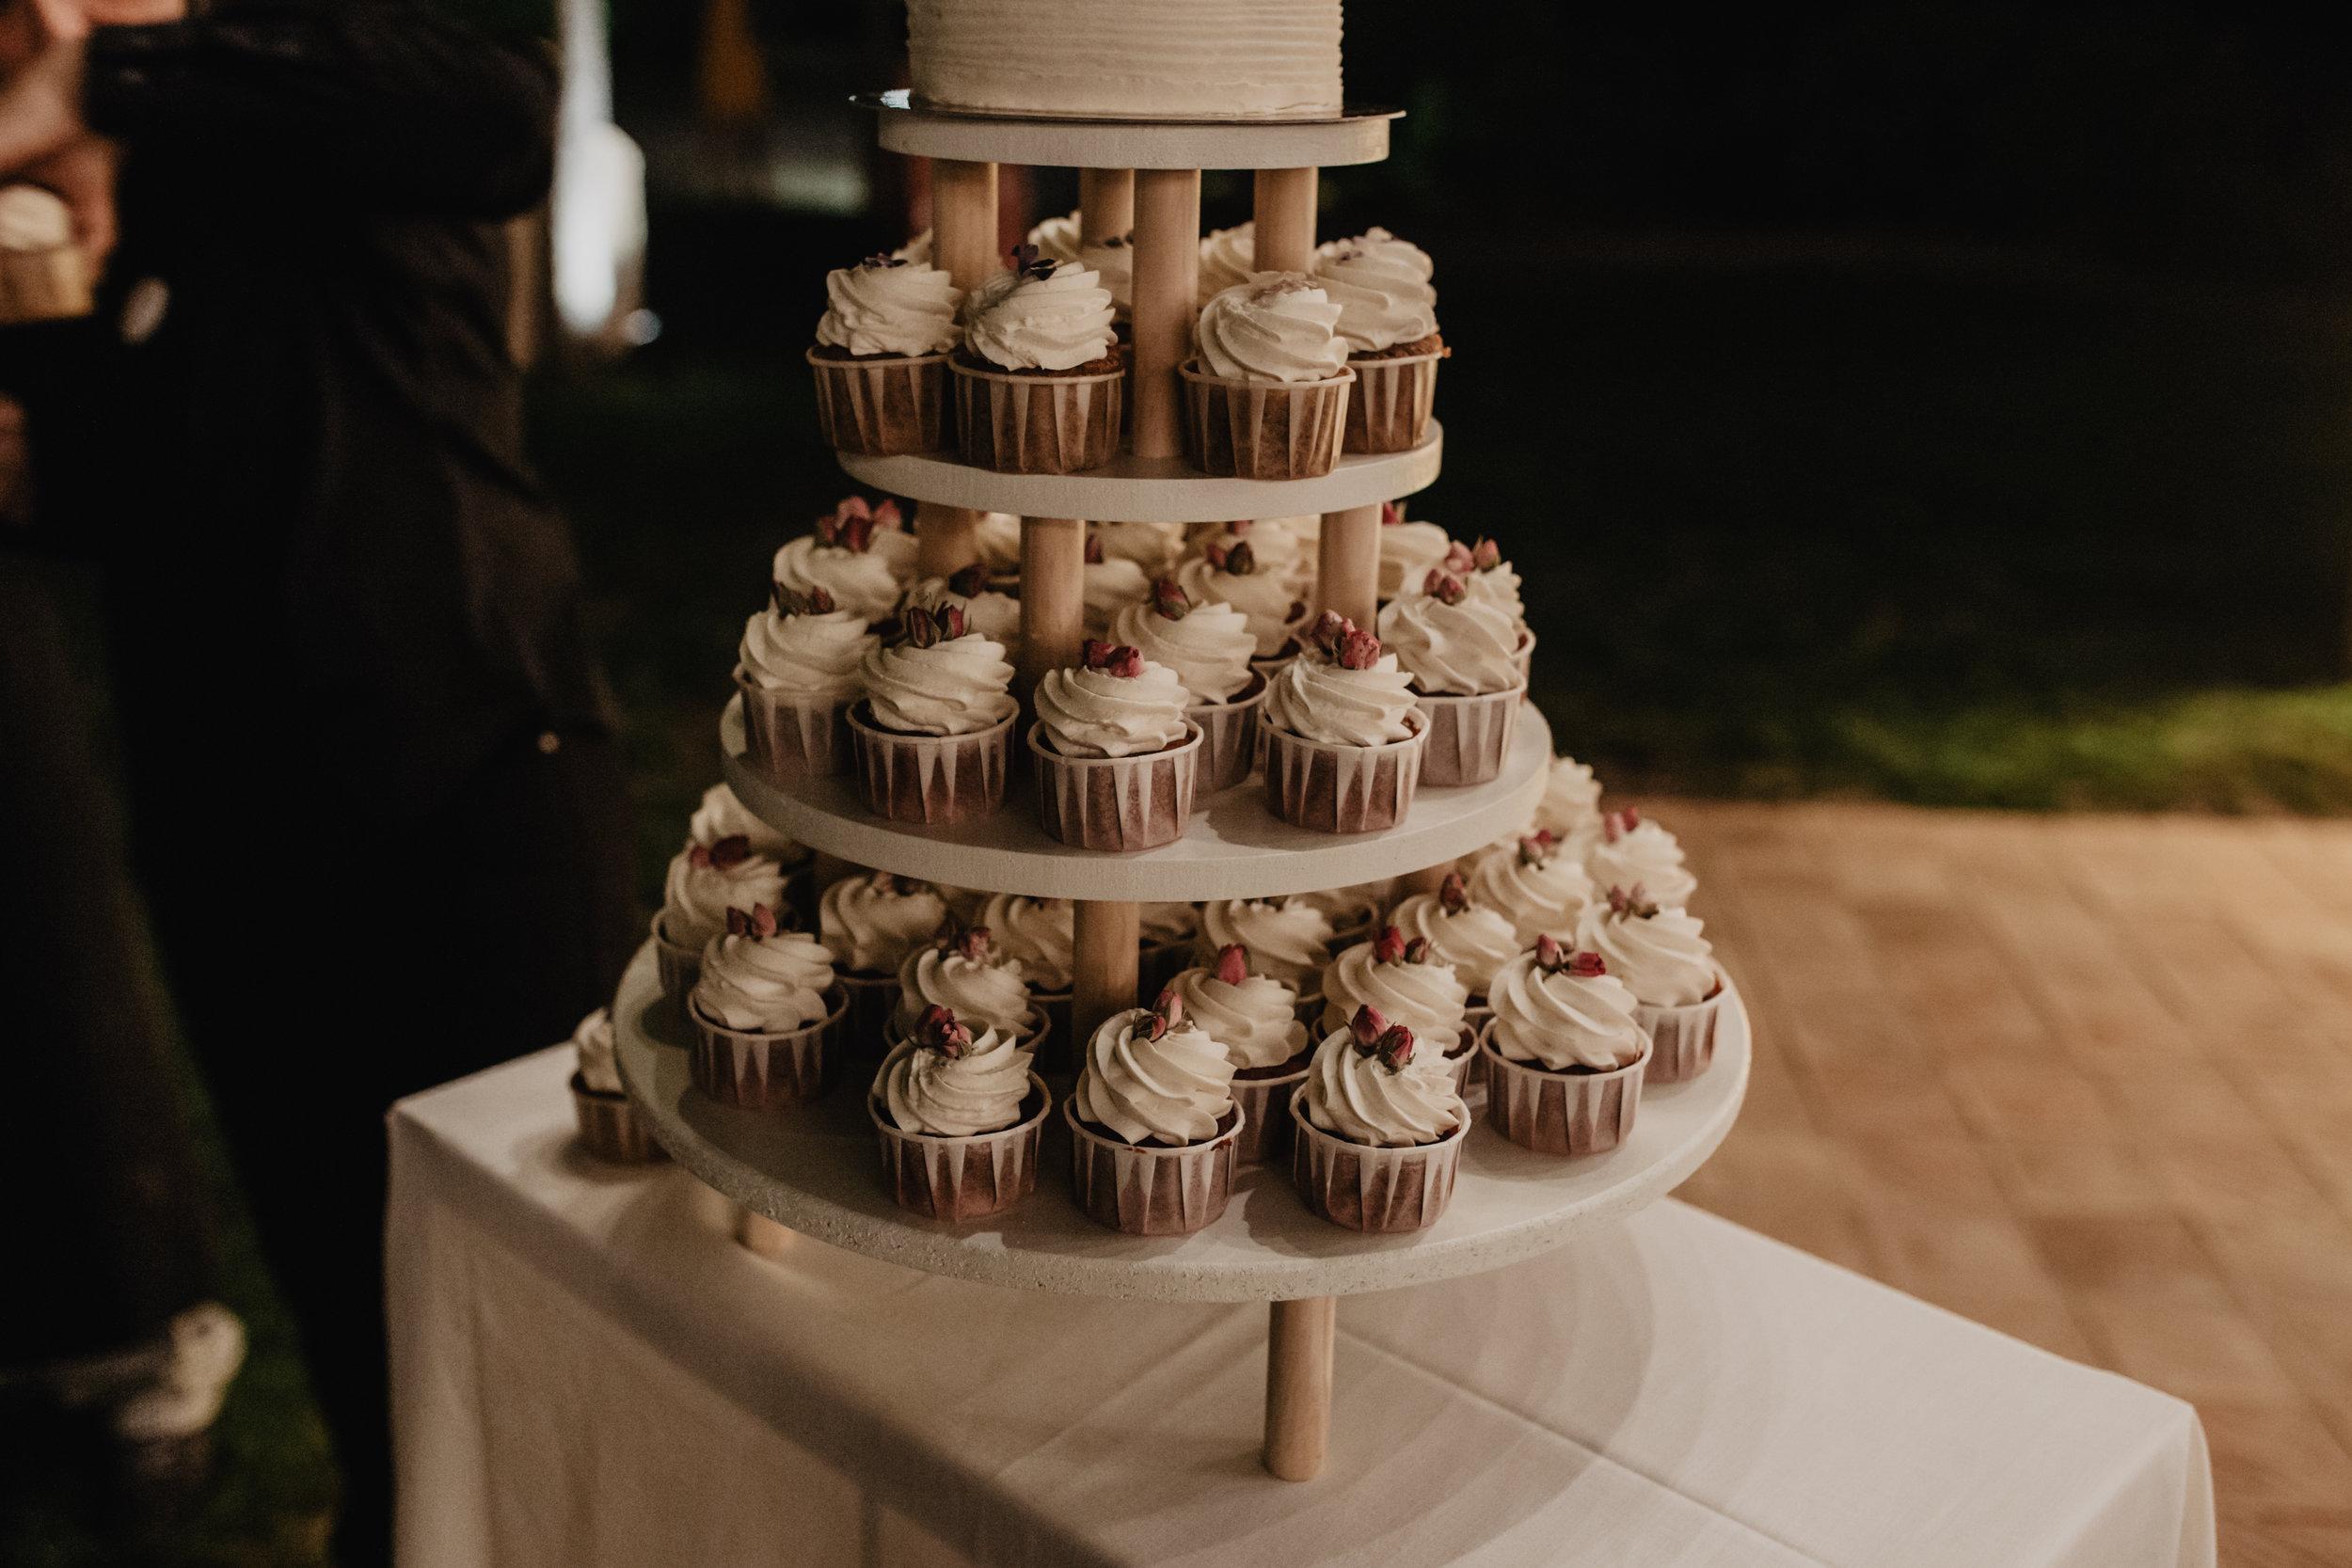 thenortherngirlphotography_photography_thenortherngirl_rebeccascabros_wedding_weddingphotography_masialagarrigadecastelladral_joaniemma_bodaenbarcelona_weddingphotographer_emmaijoan-898.jpg